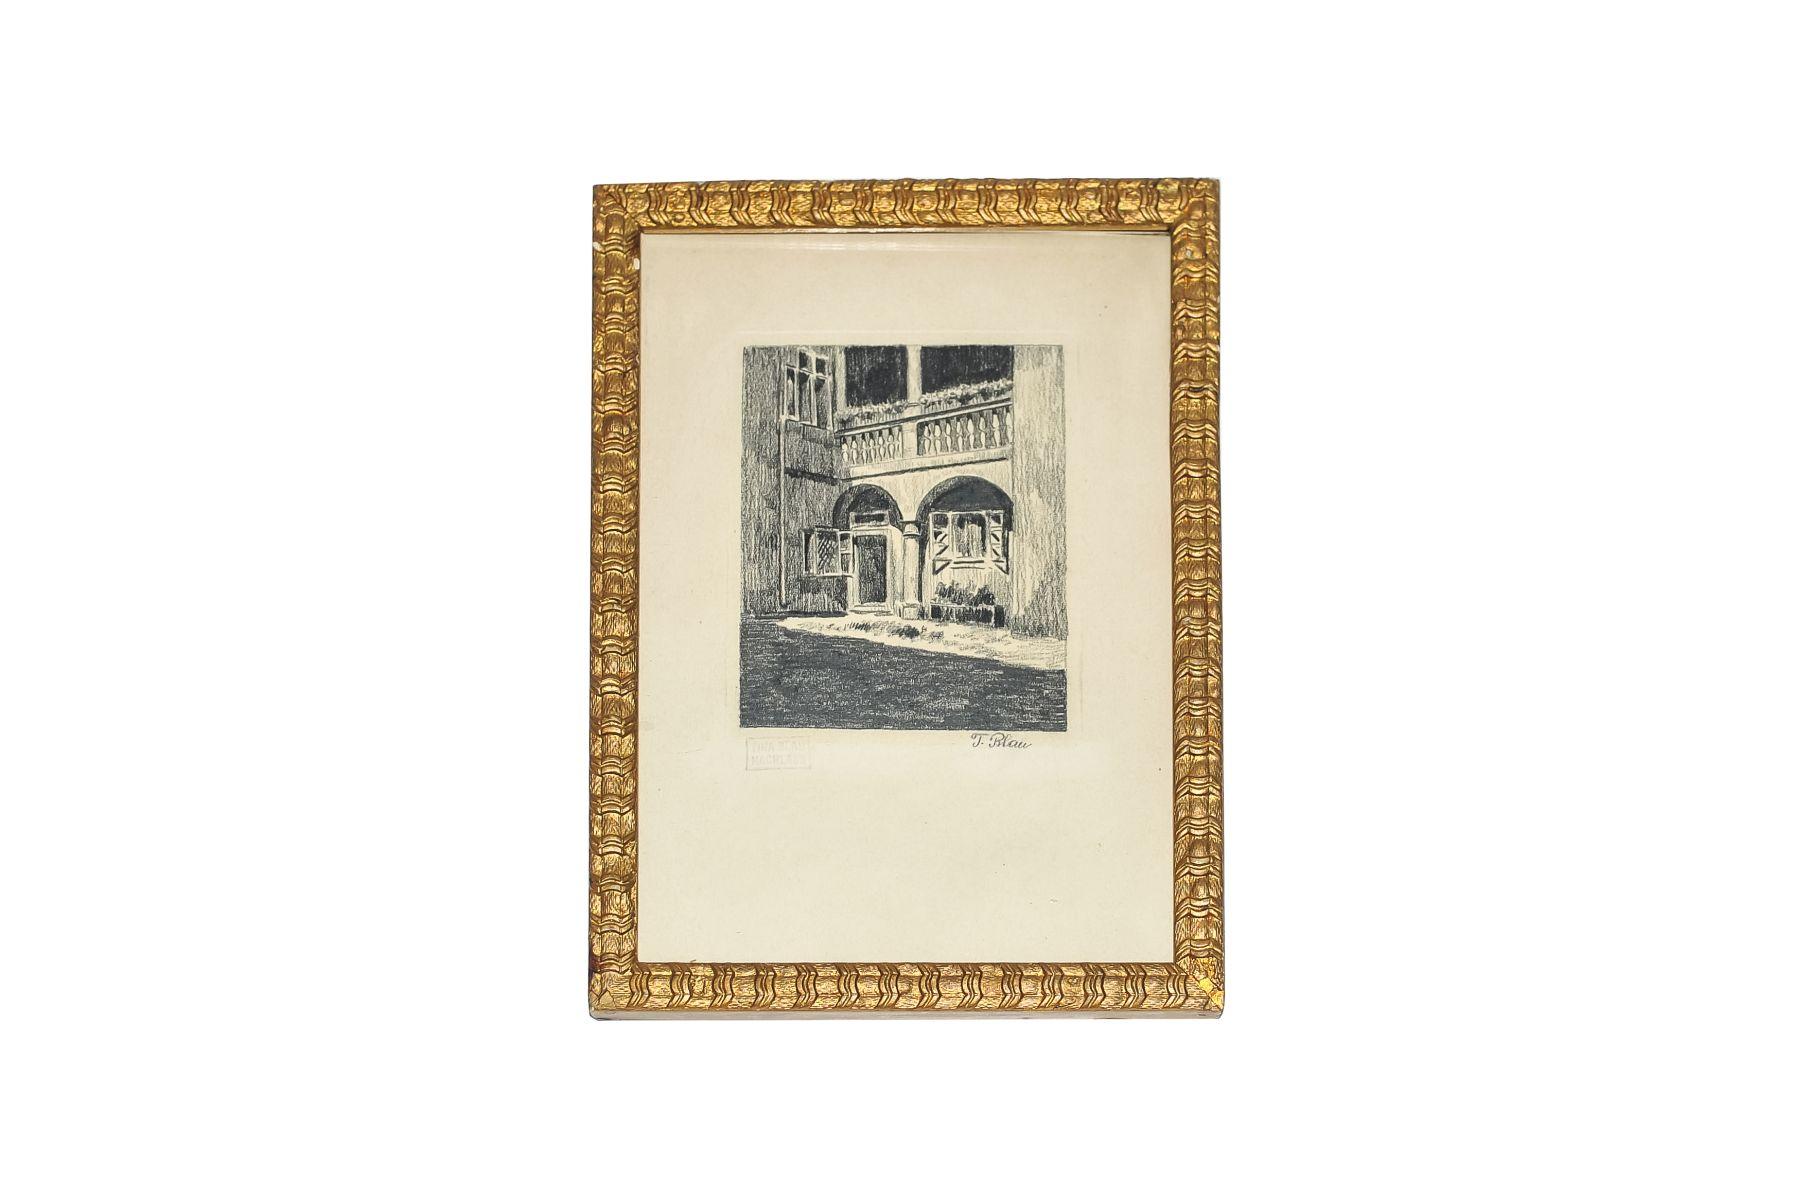 #133 Tina Blau (1845-1916) Image